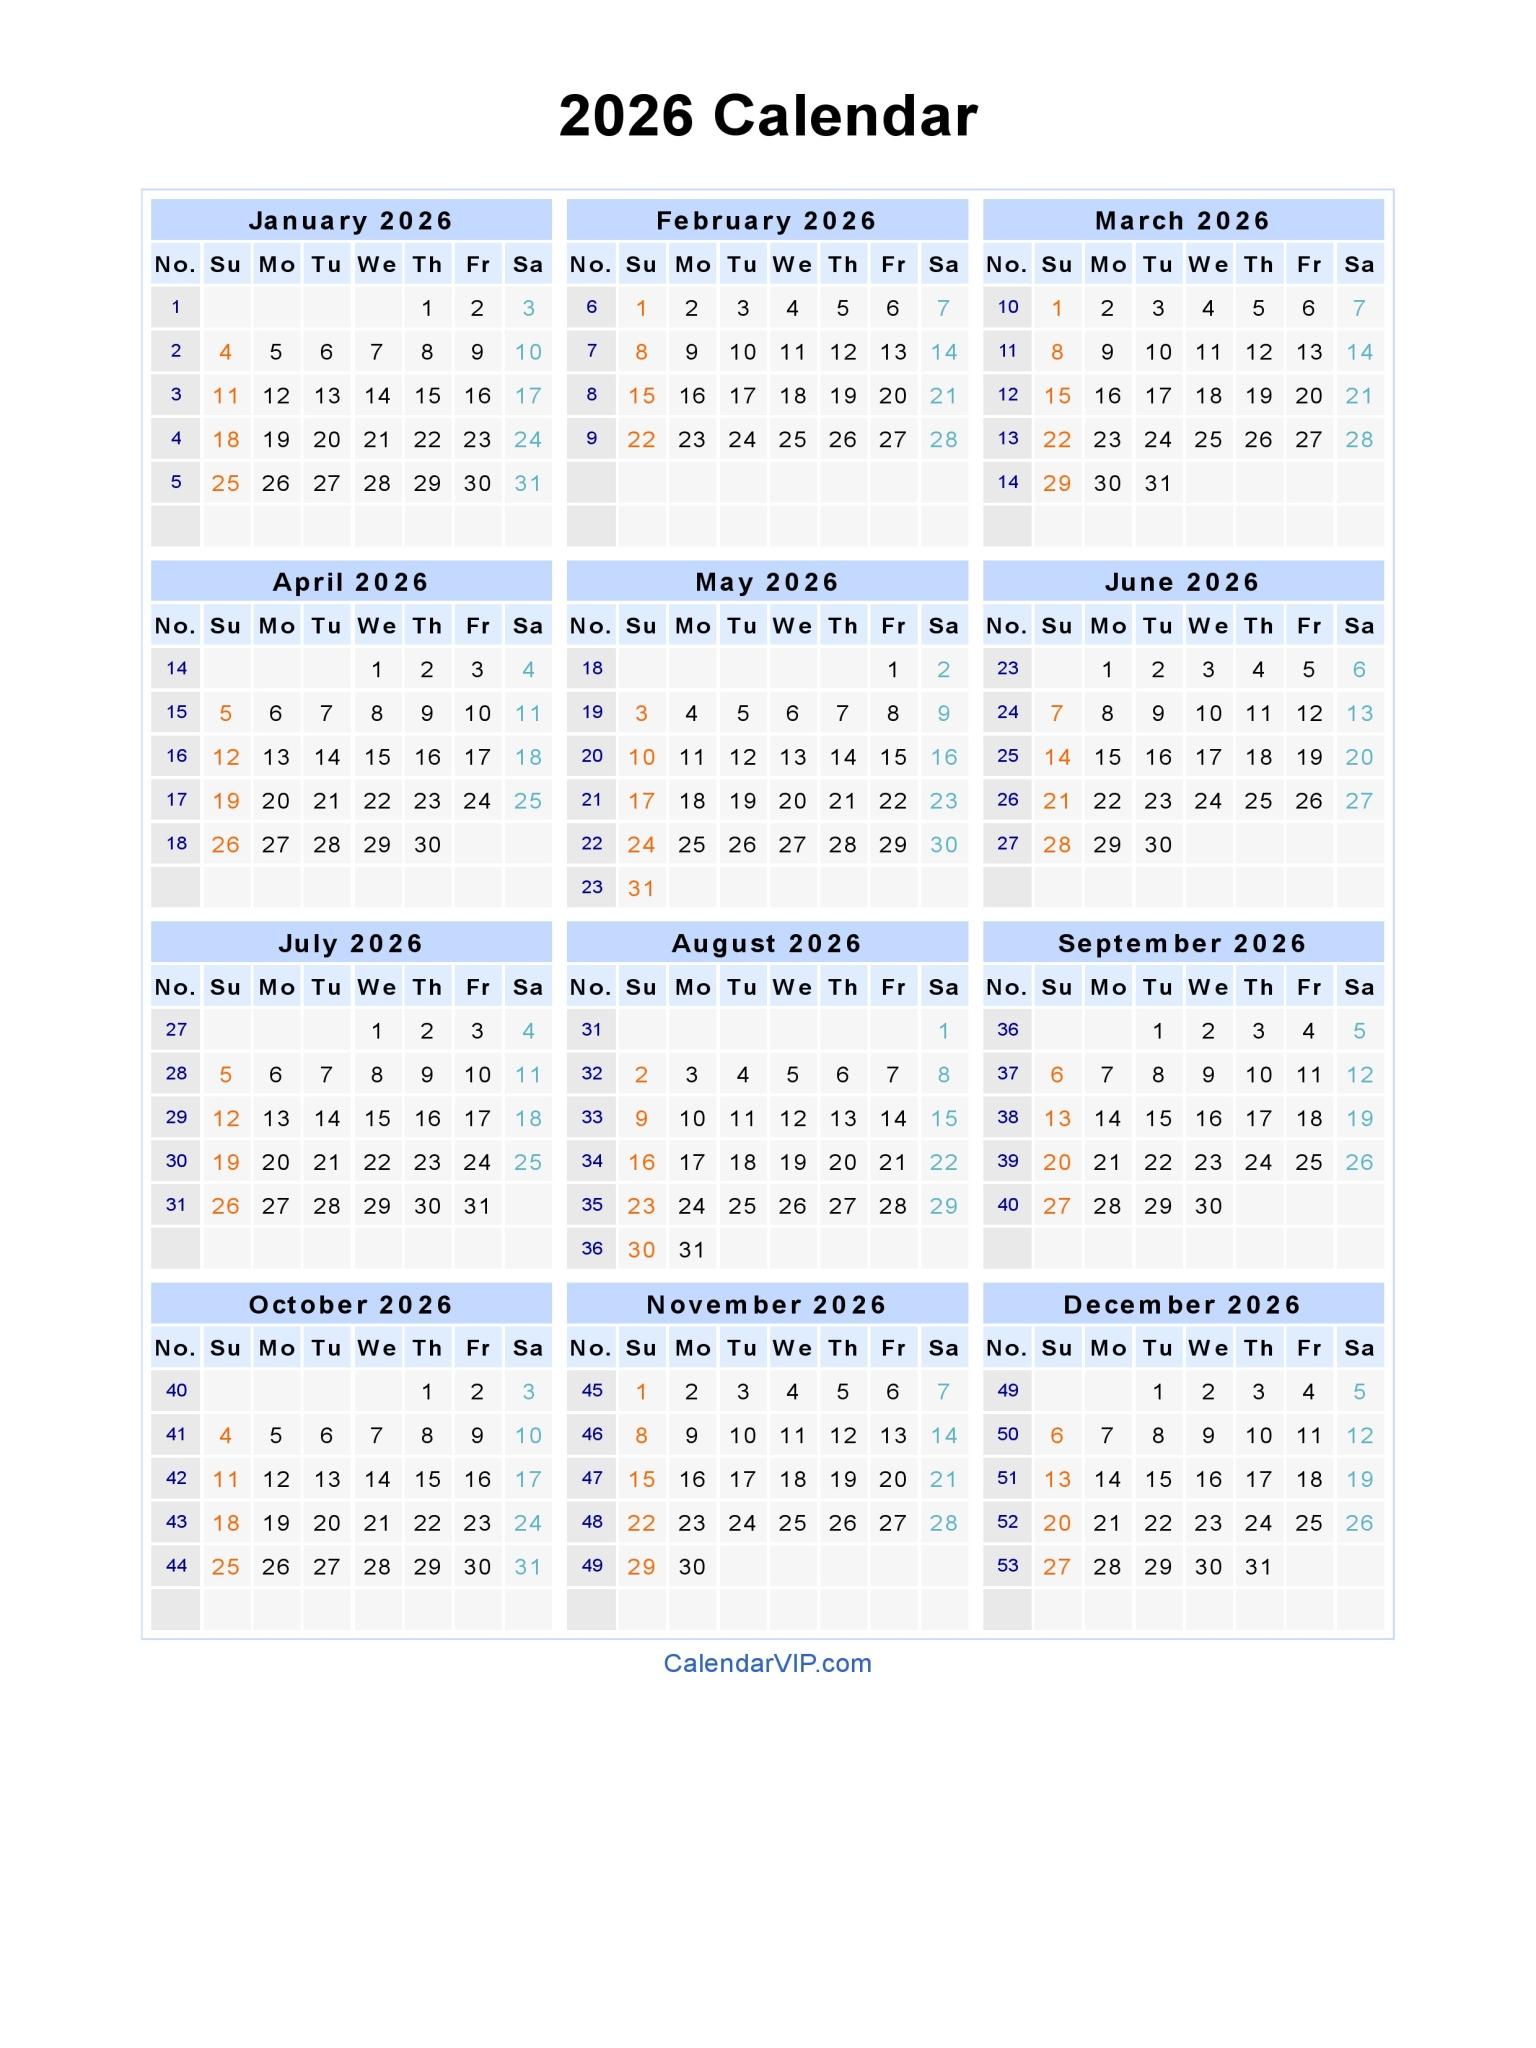 2026 Calendar - Blank Printable Calendar Template In Pdf